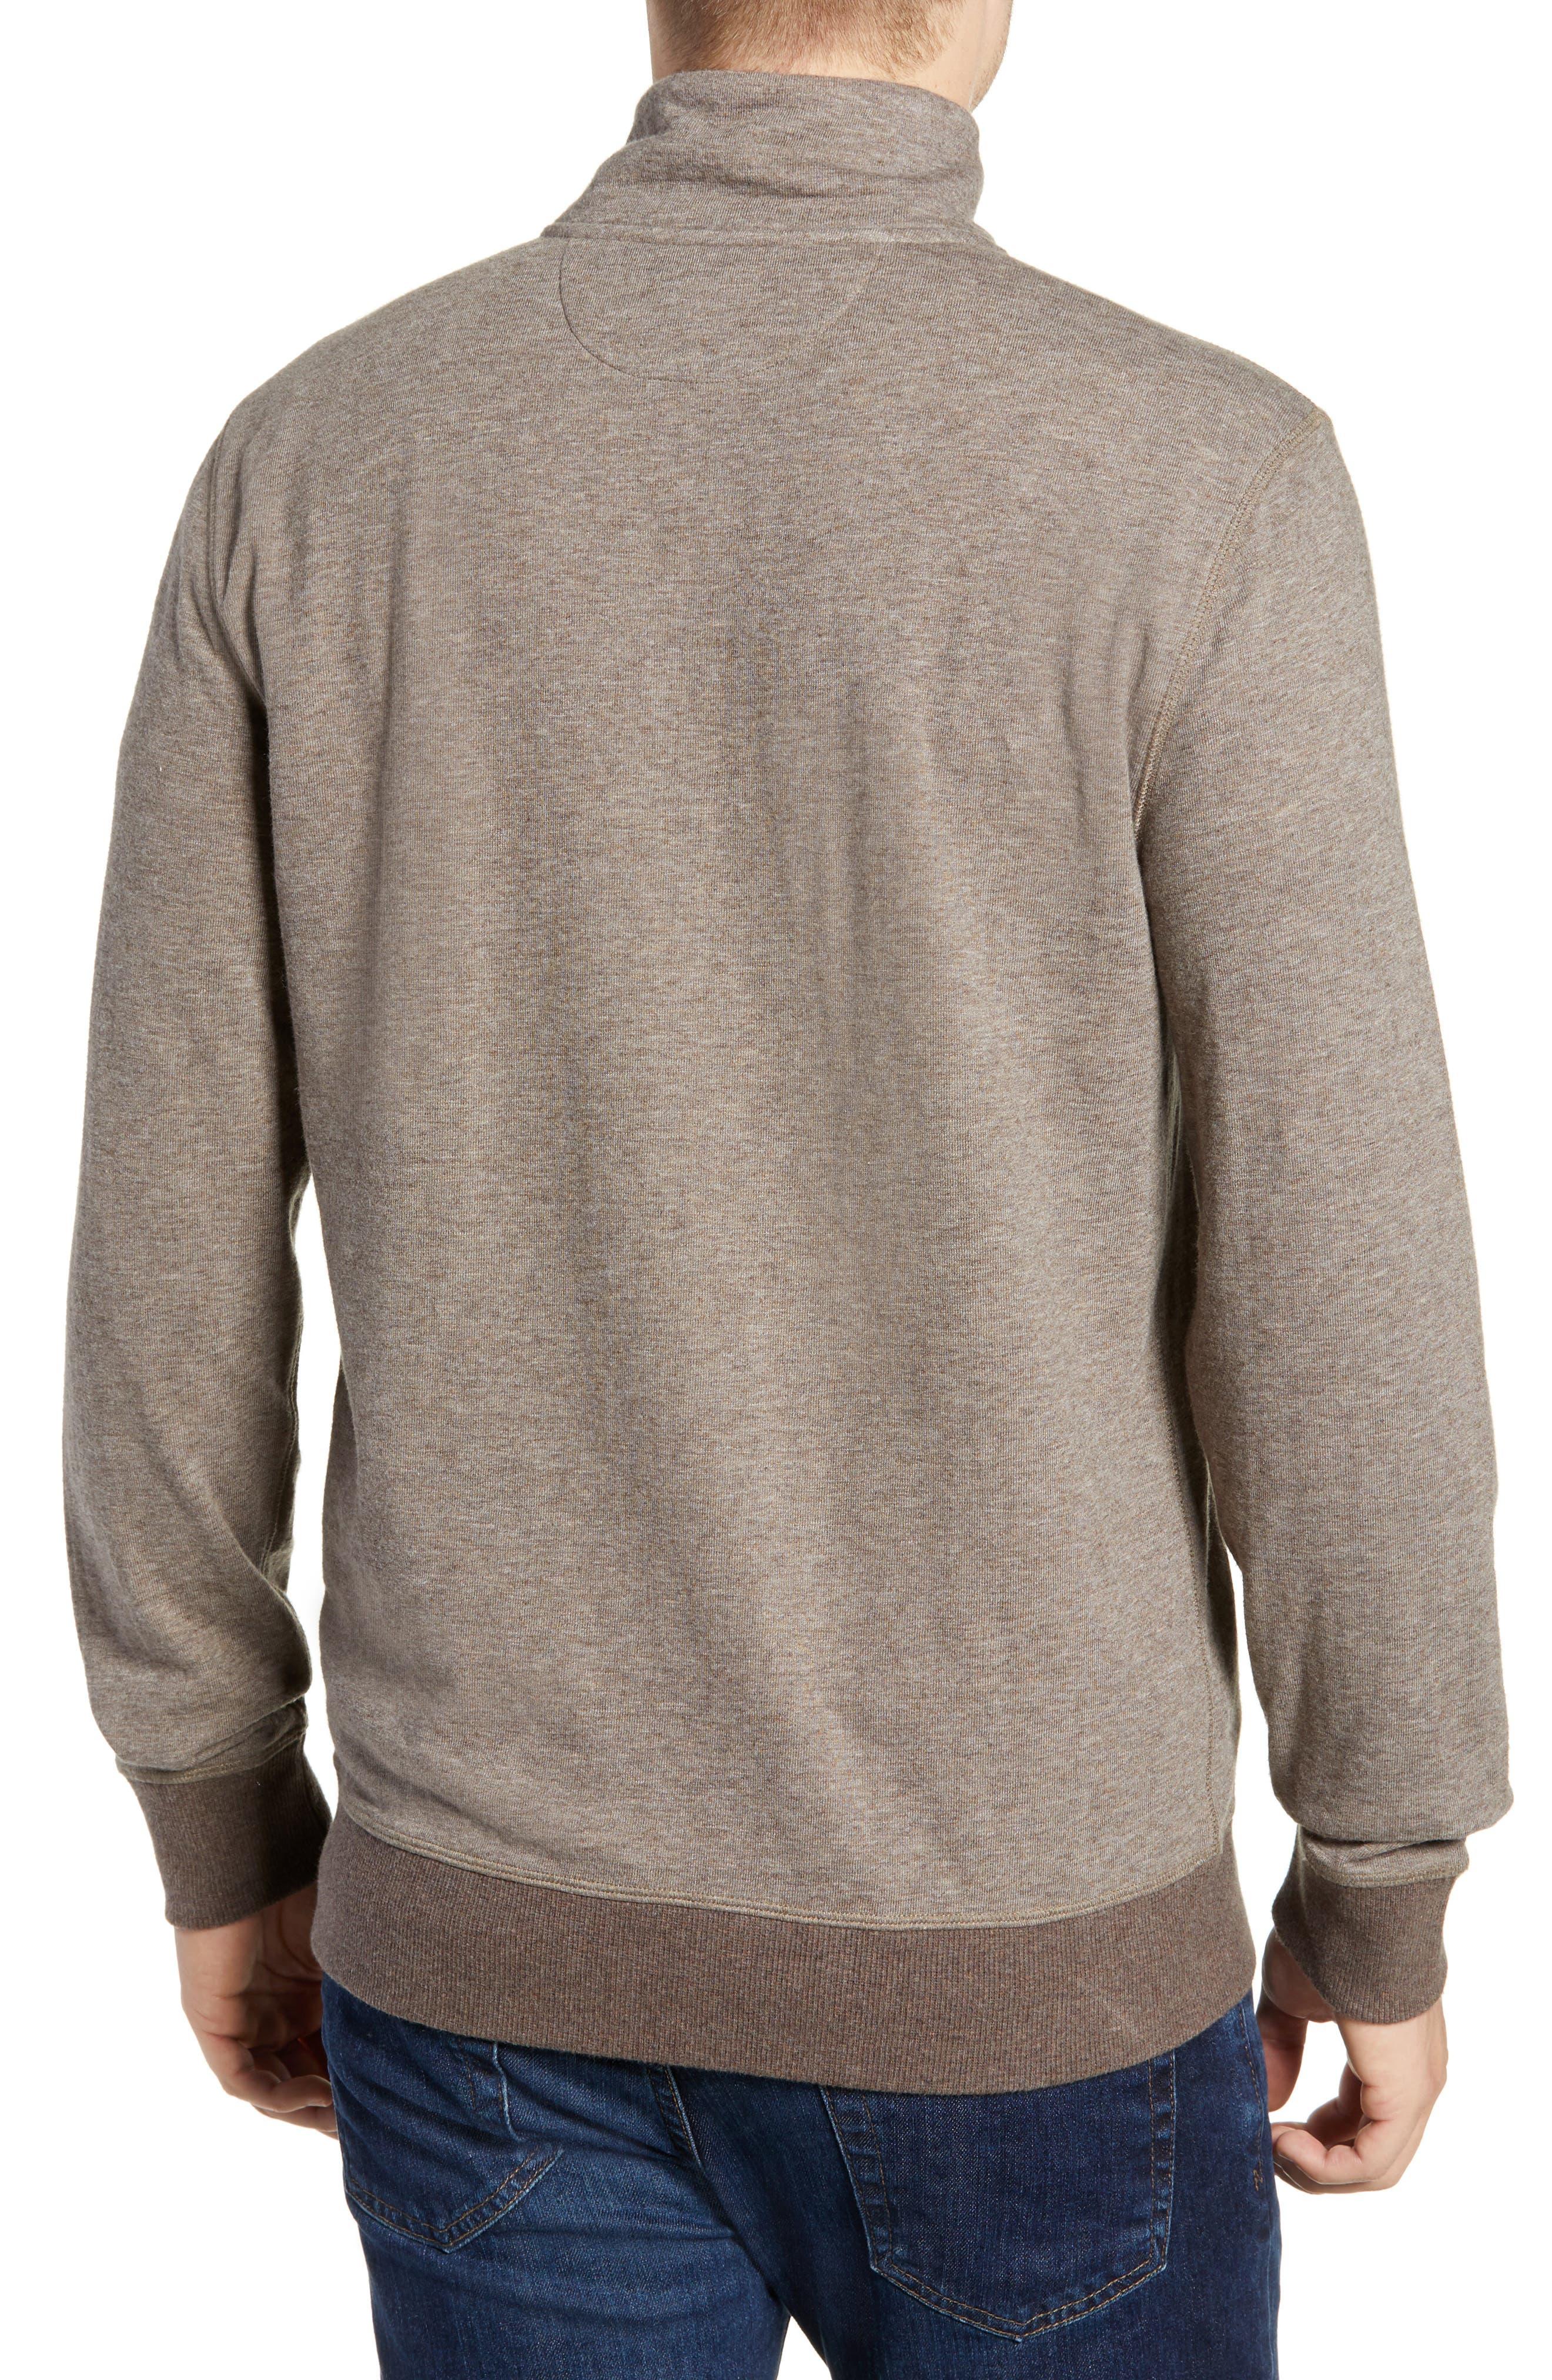 Dual Knit Regular Fit Quarter Zip Pullover,                             Alternate thumbnail 2, color,                             CHESTNUT